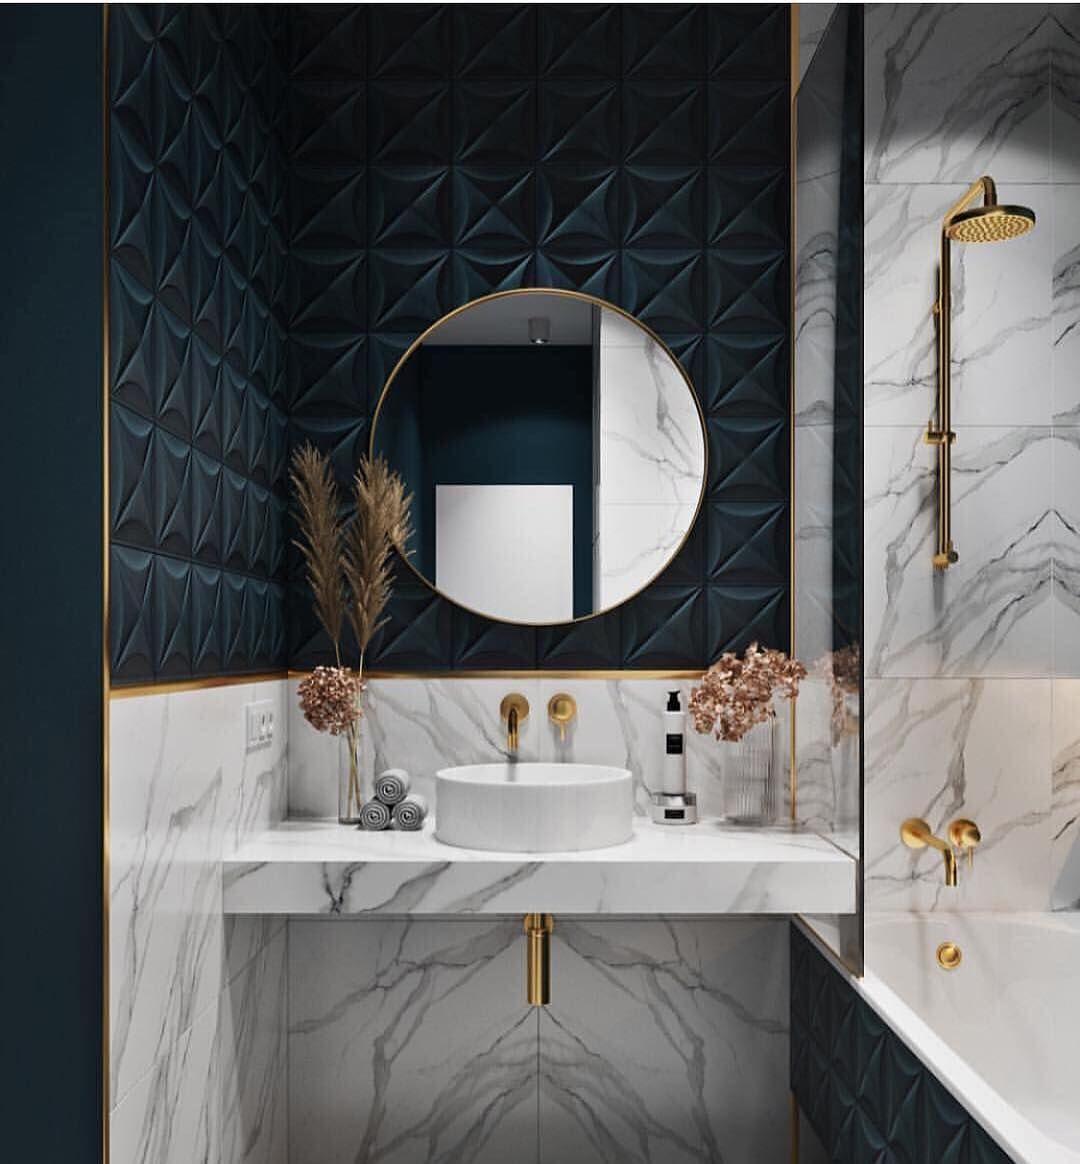 Full Time Design On Instagram When Midnight Blue And Marble Collide Korolev Design Ashleytst Gorgeous Bathroom Bathroom Design Bathroom Interior Design